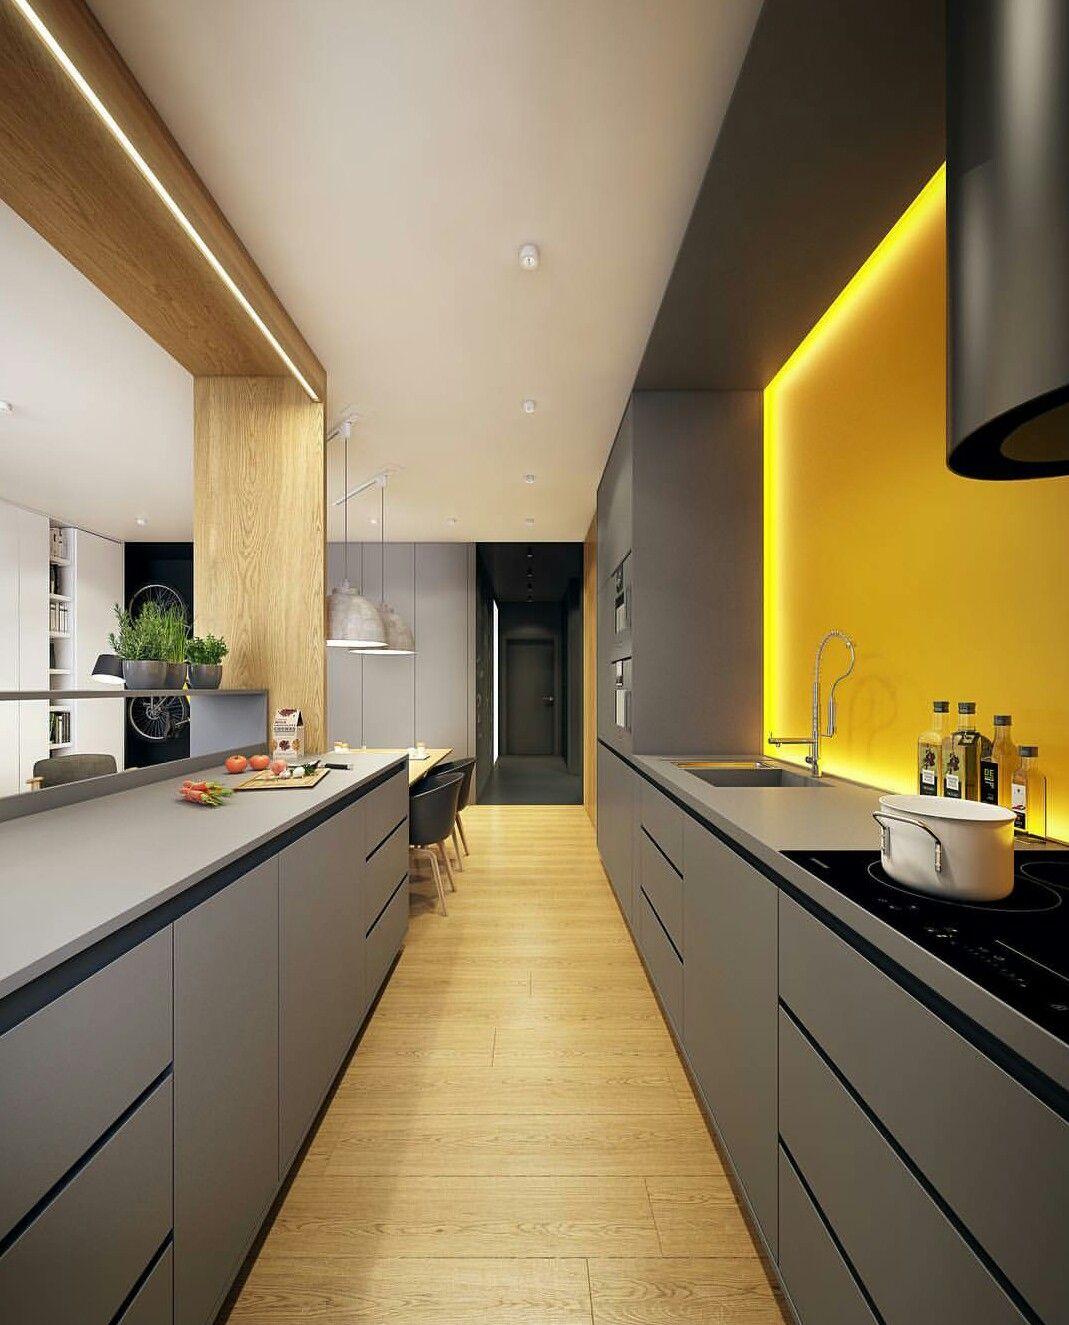 Pin By Côté Maison On Het Hiernamaals Kitchen Design Kitchen Decor Apartment Kitchen Design Small